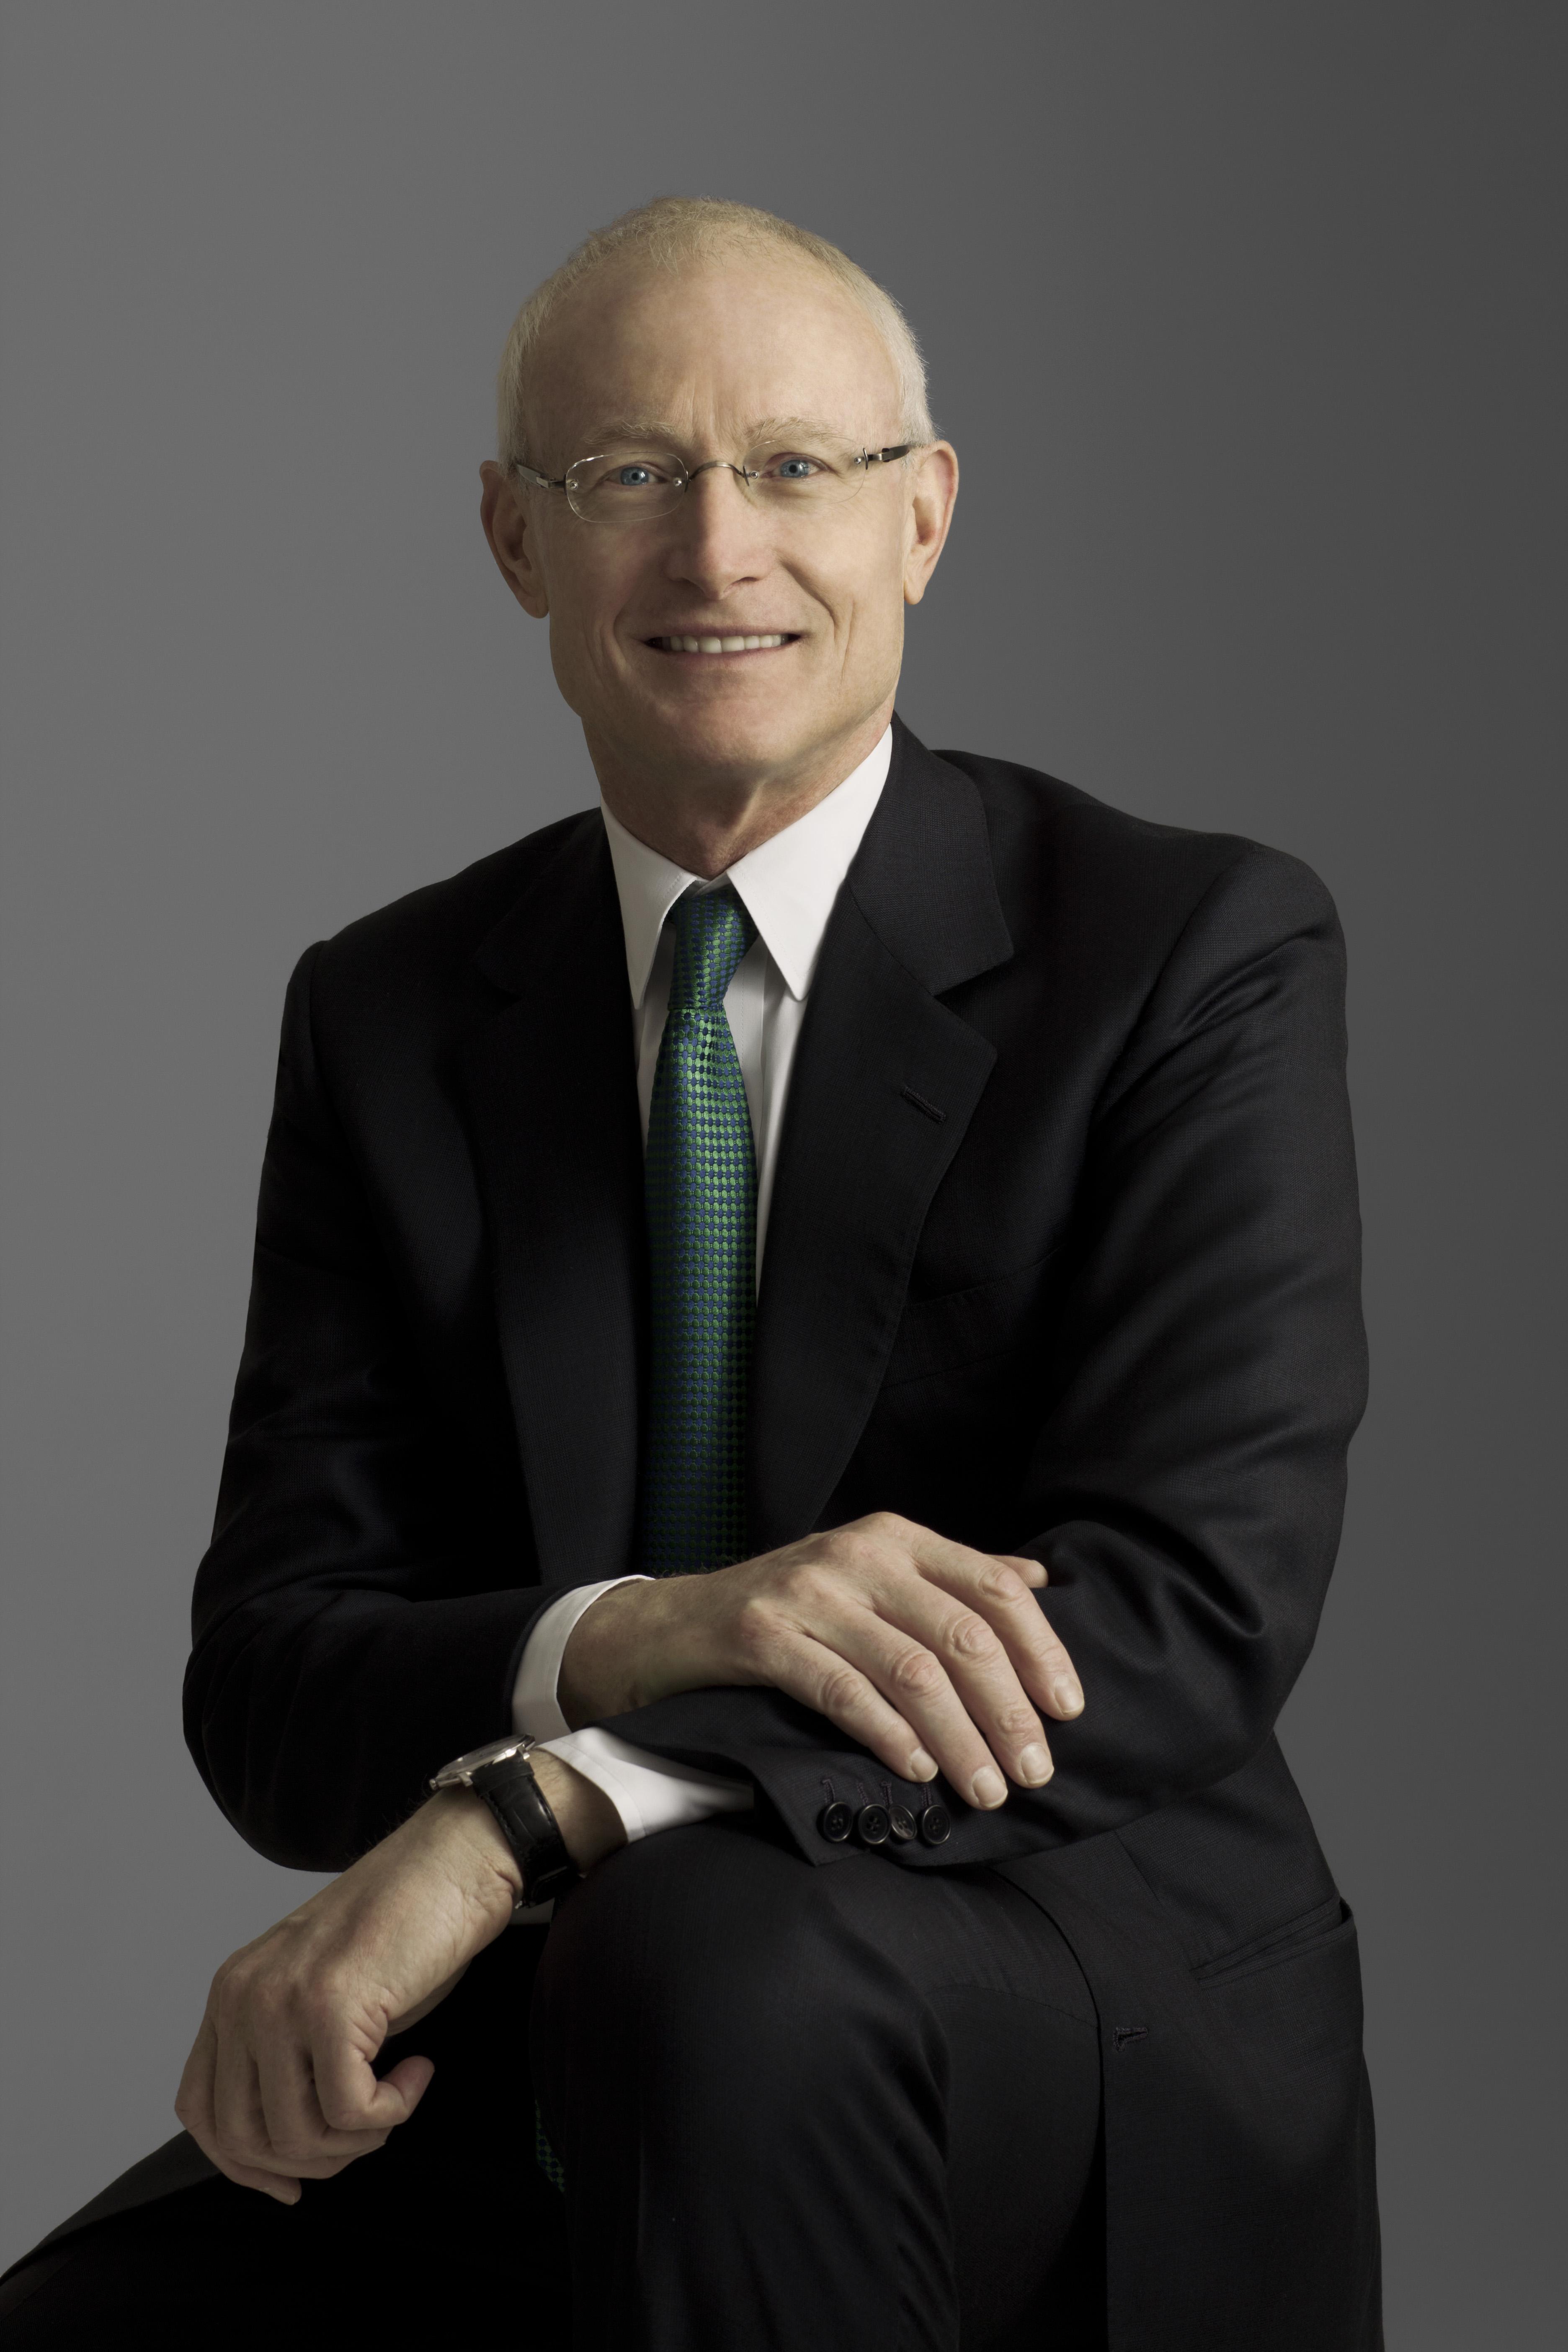 Michael Porter net worth